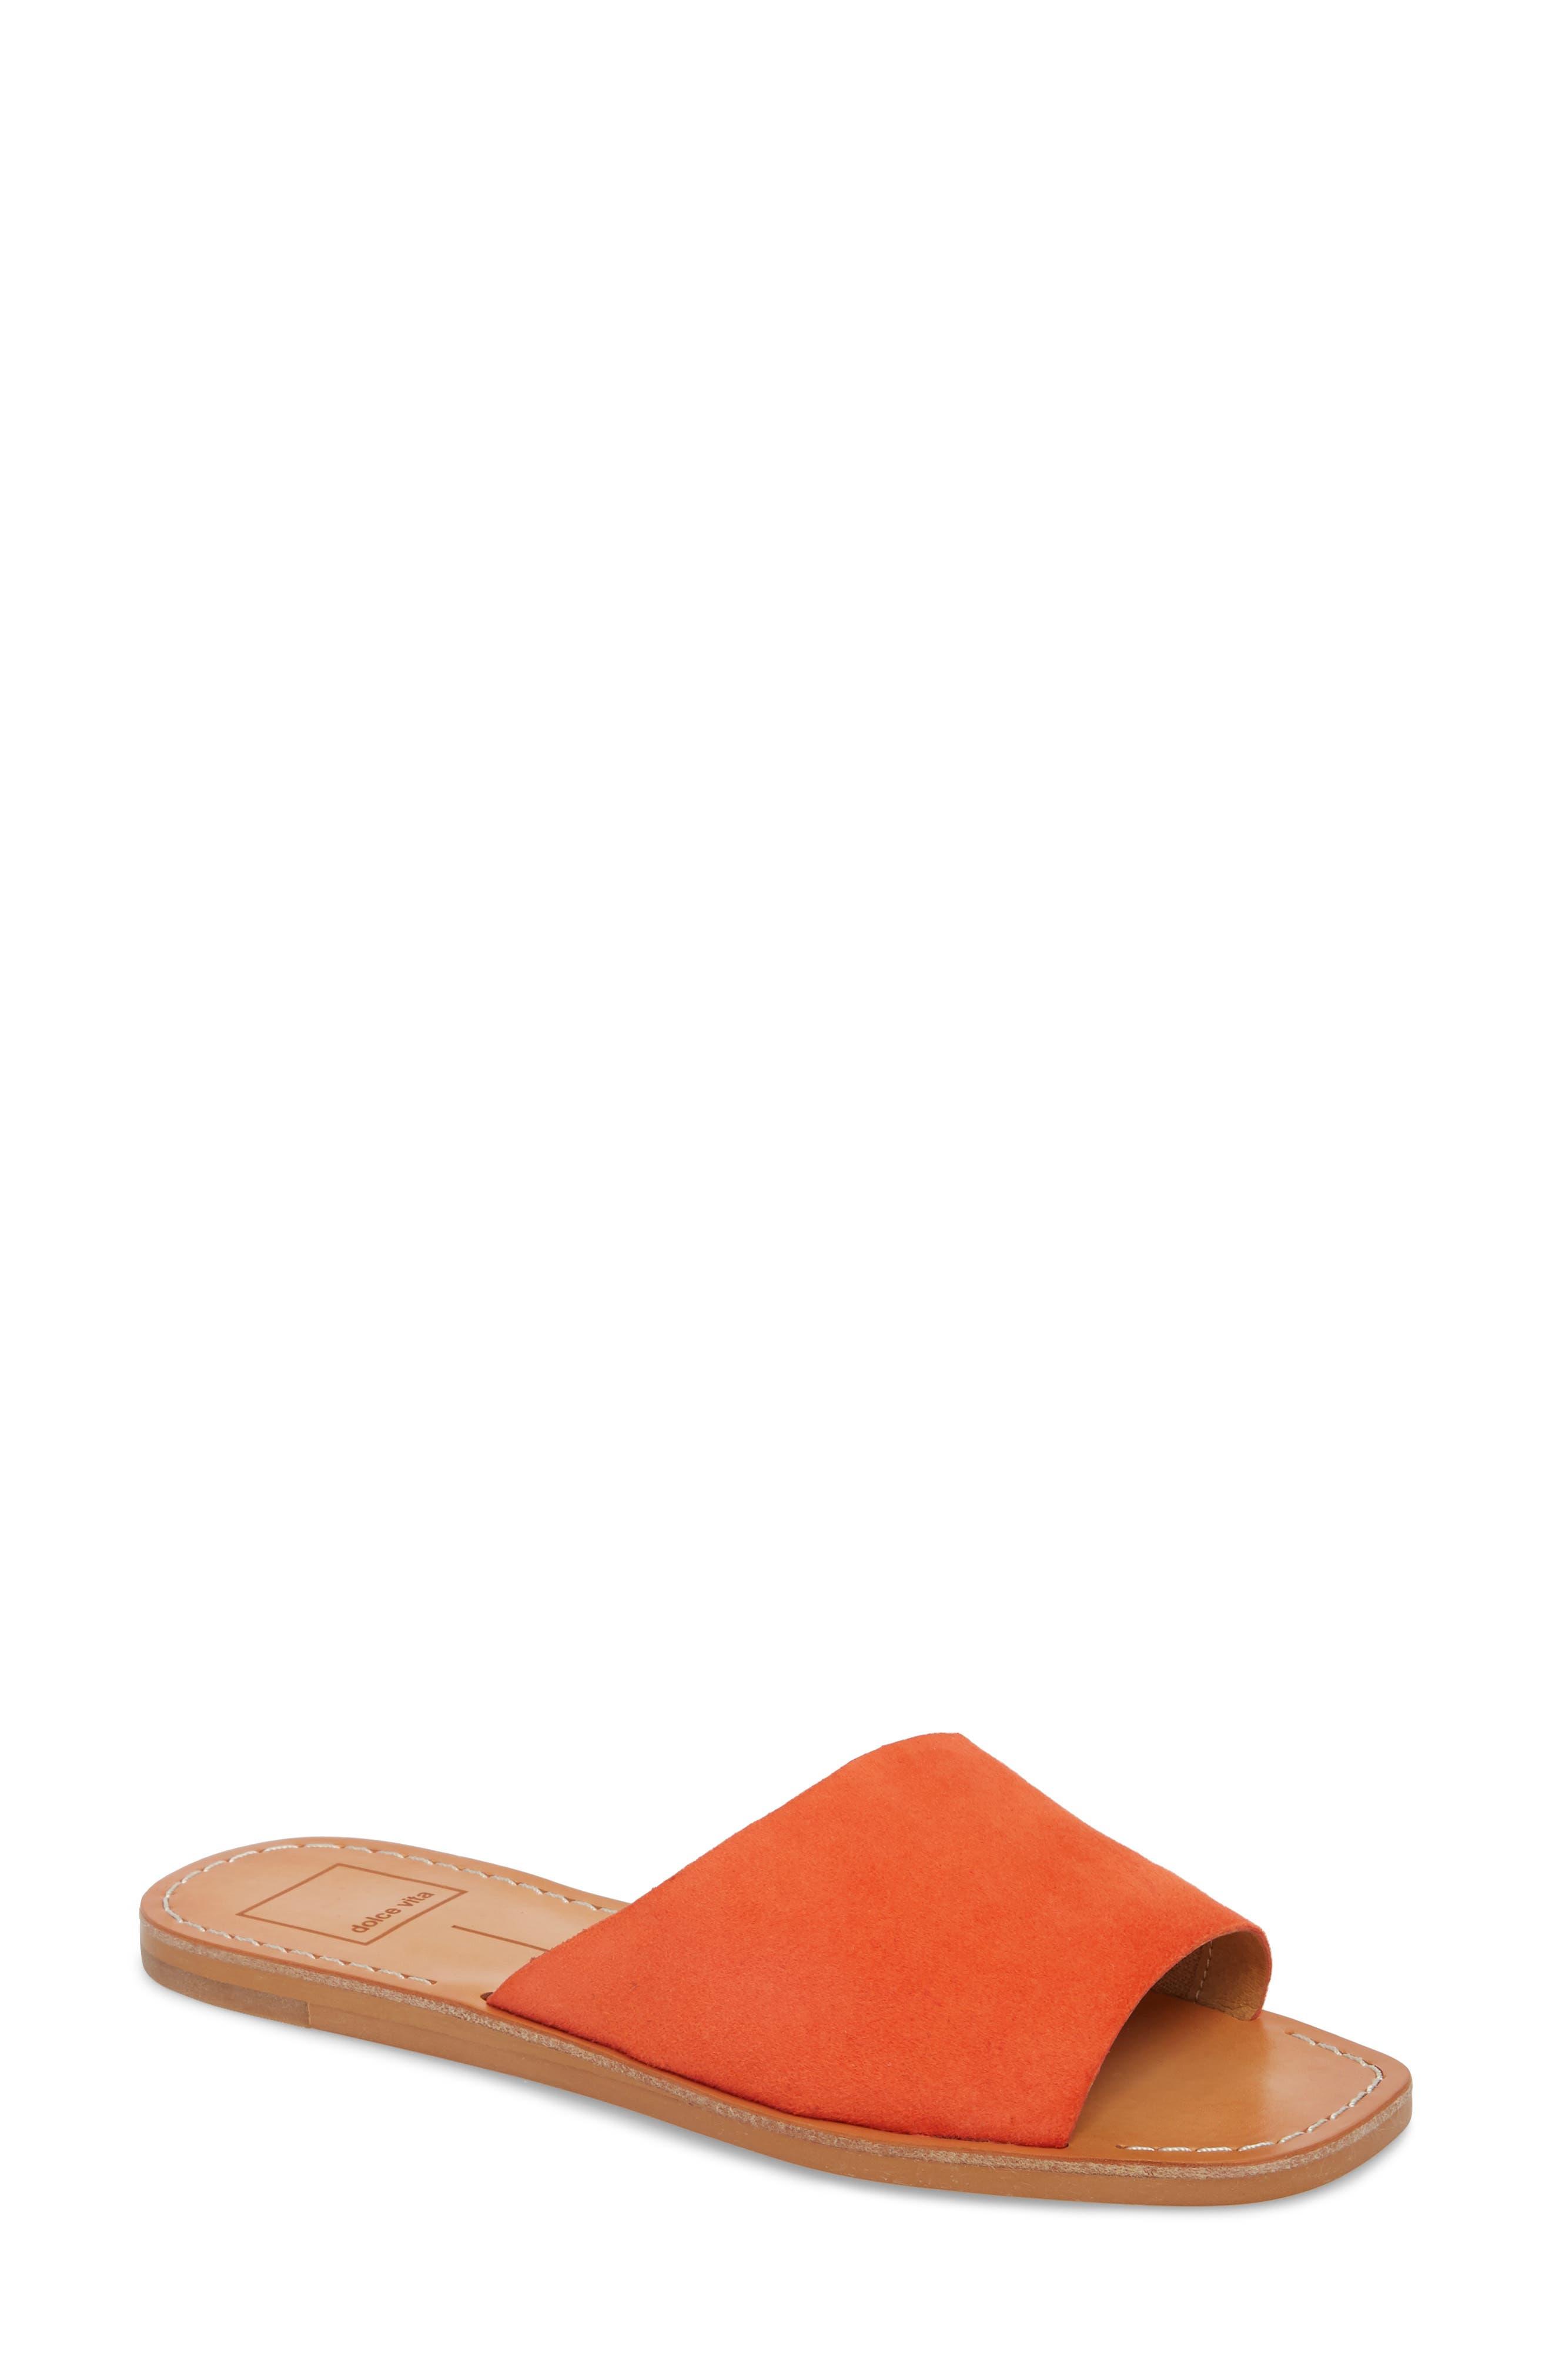 Cato Asymmetrical Slide Sandal,                         Main,                         color, Orange Suede